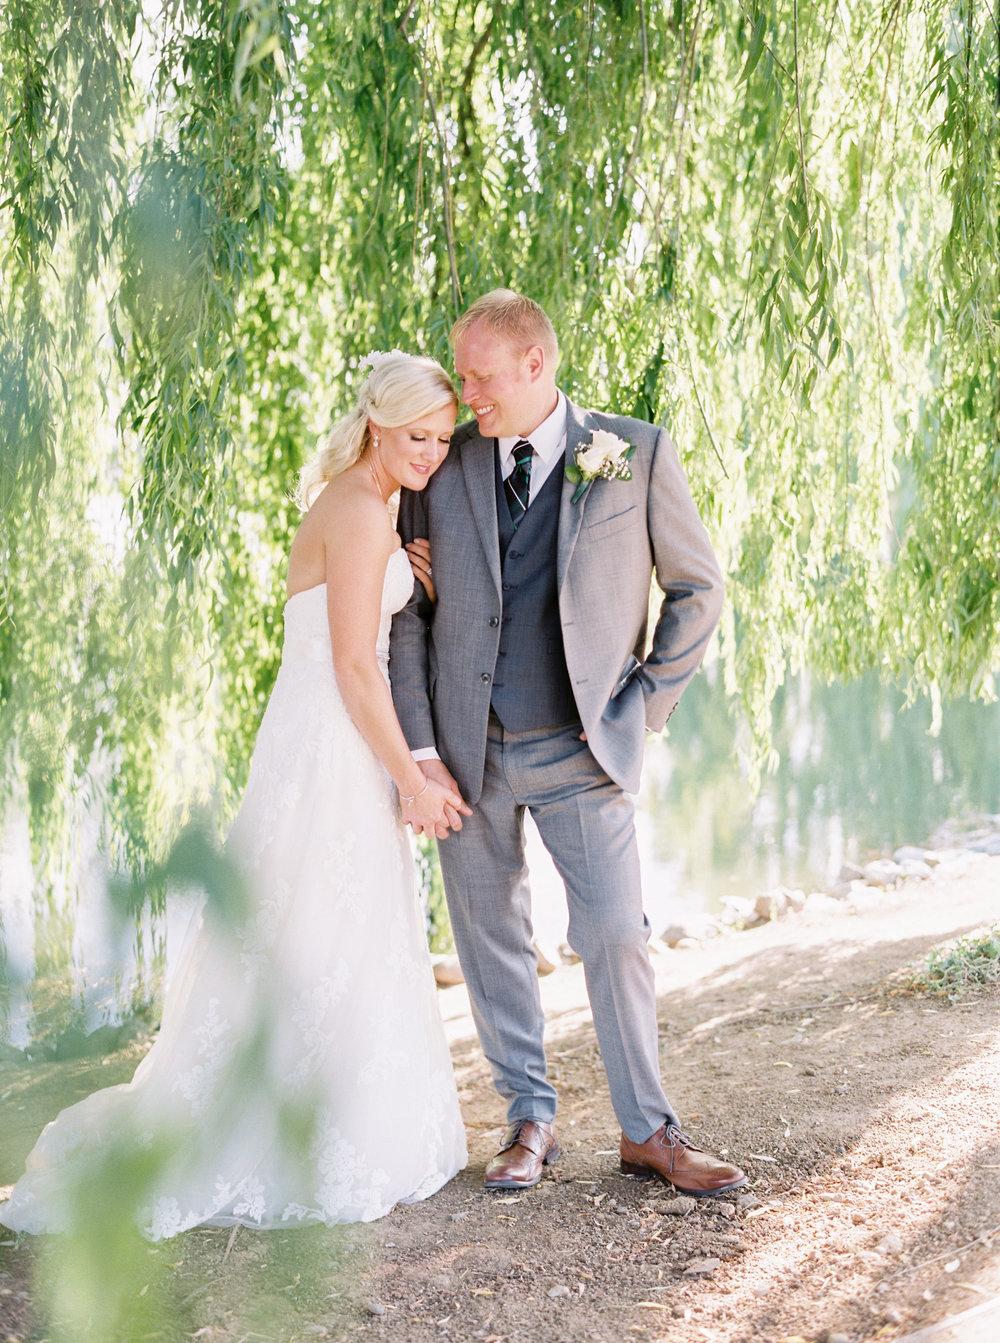 wolfe-heights-event-center-wedding-sacramento-california-wedding-64.jpg